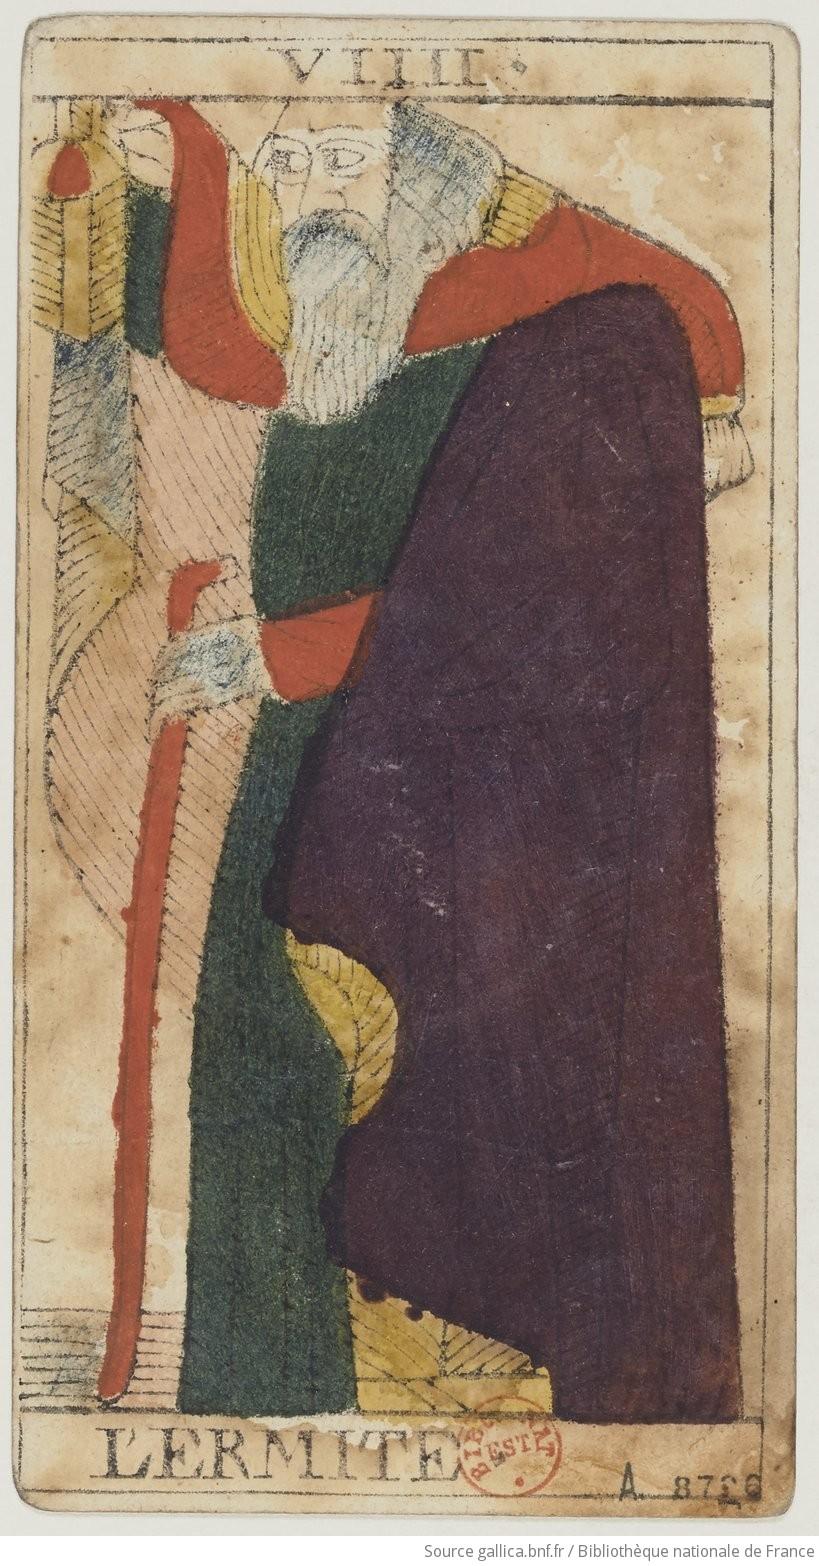 http://gallica.bnf.fr/ark:/12148/btv1b10536116h/f27.highres